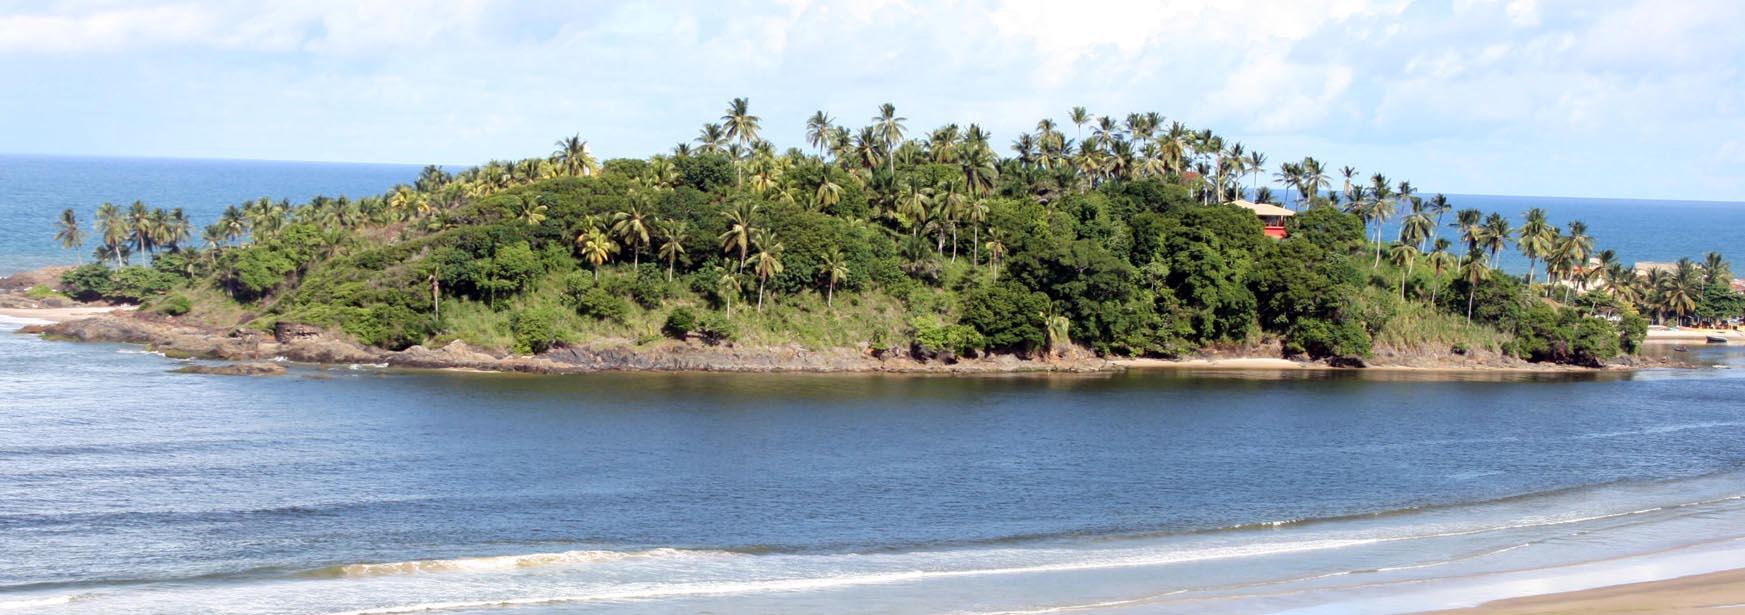 Morro de Pernambuco. Imagem: Gidelzo Silva/Secom-Ilhéus.